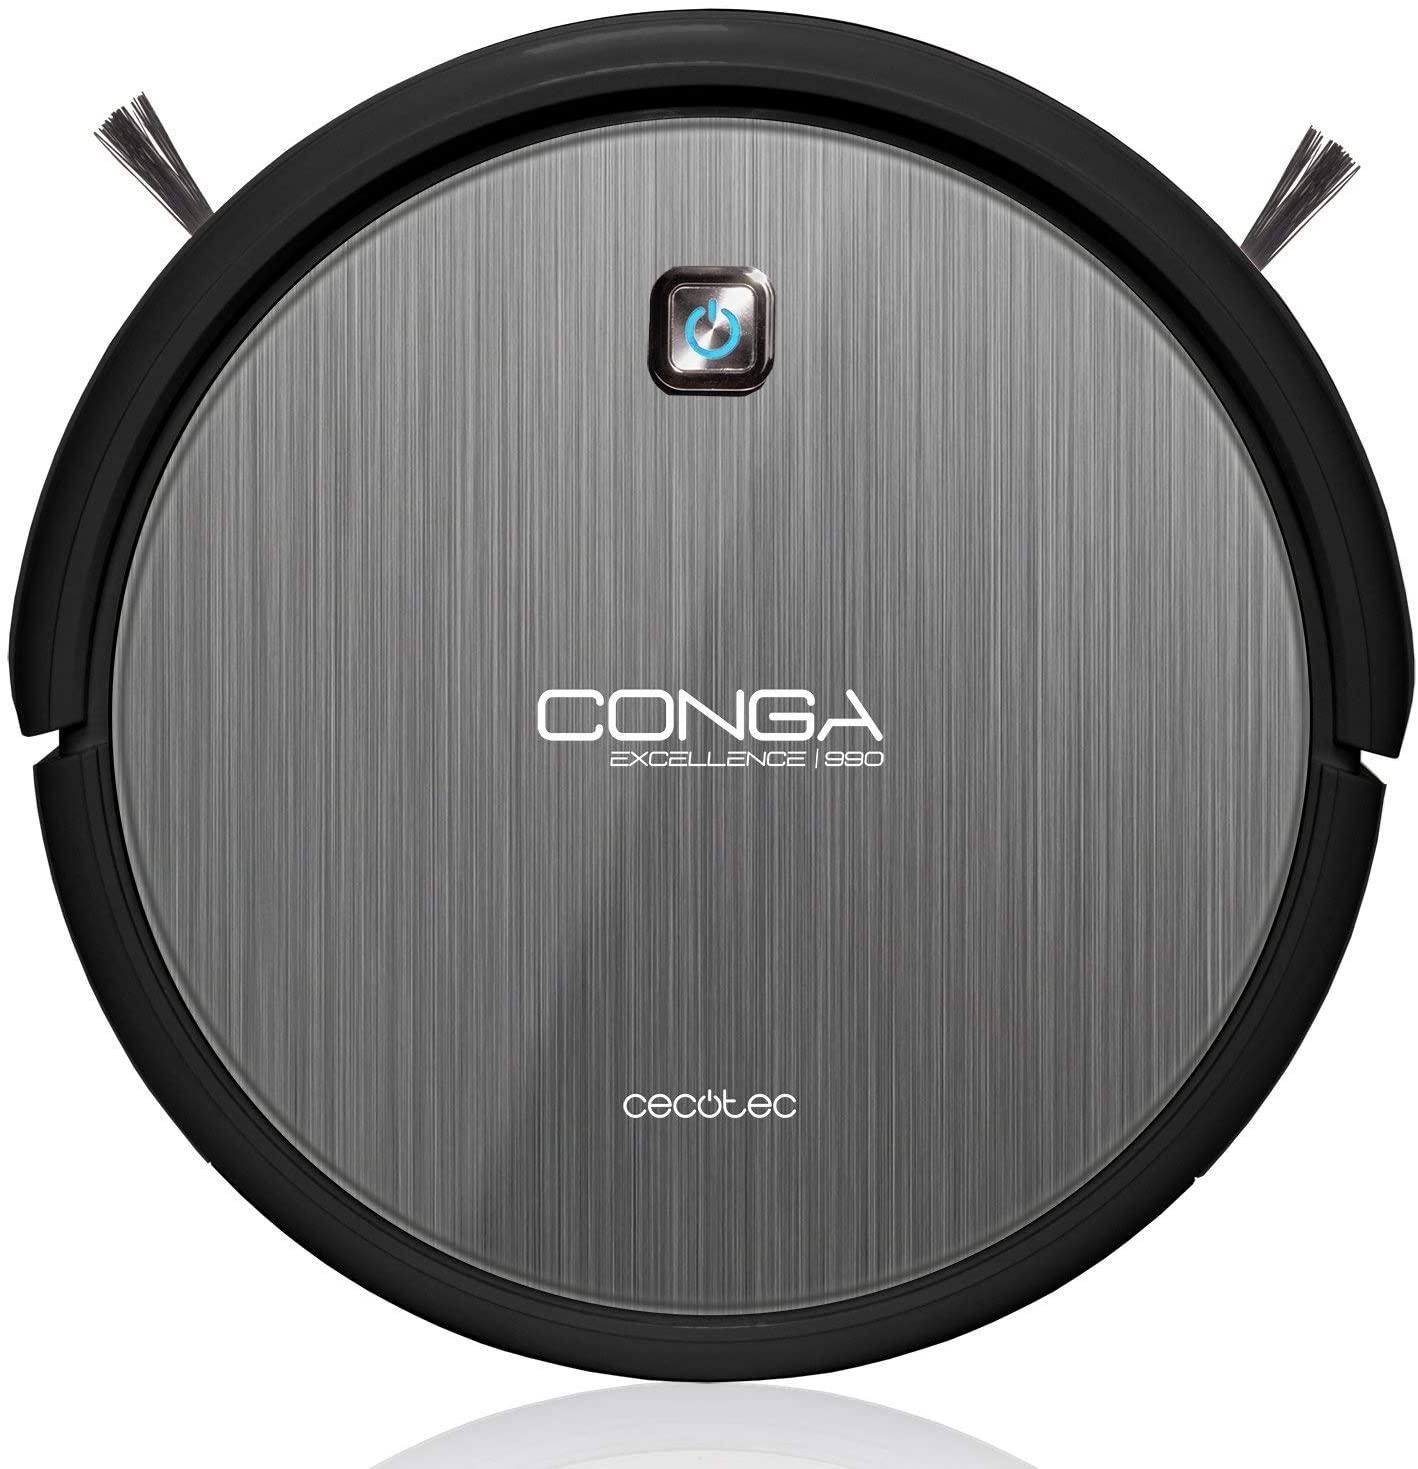 Cecotec Conga Excellence 990 Amazon